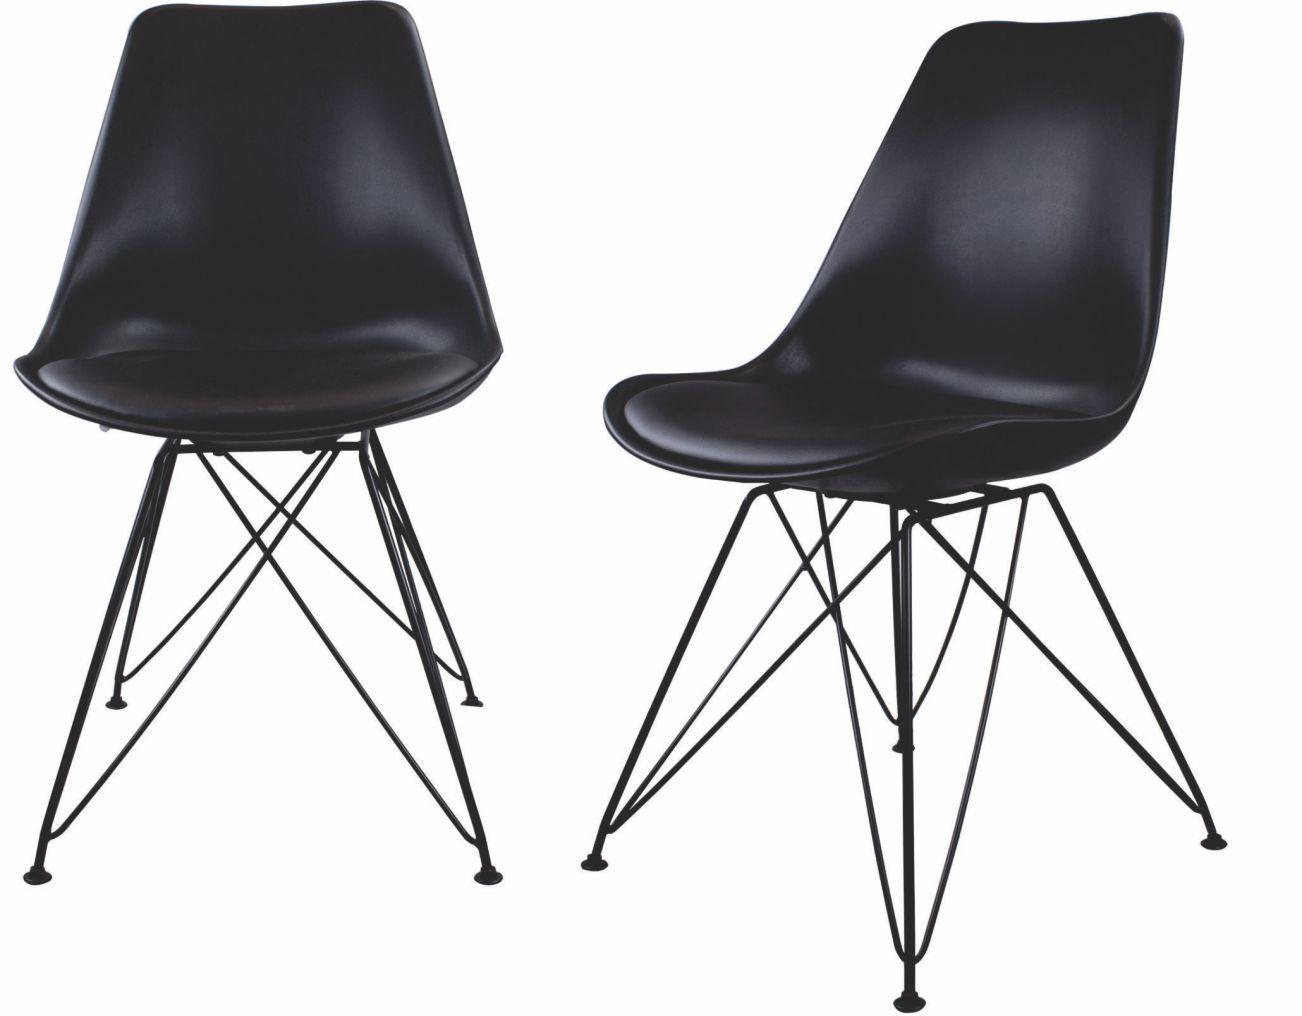 Kit com 2 Cadeiras Charles Eames Eiffel Preta Base Metal Pelegrin Pw-075